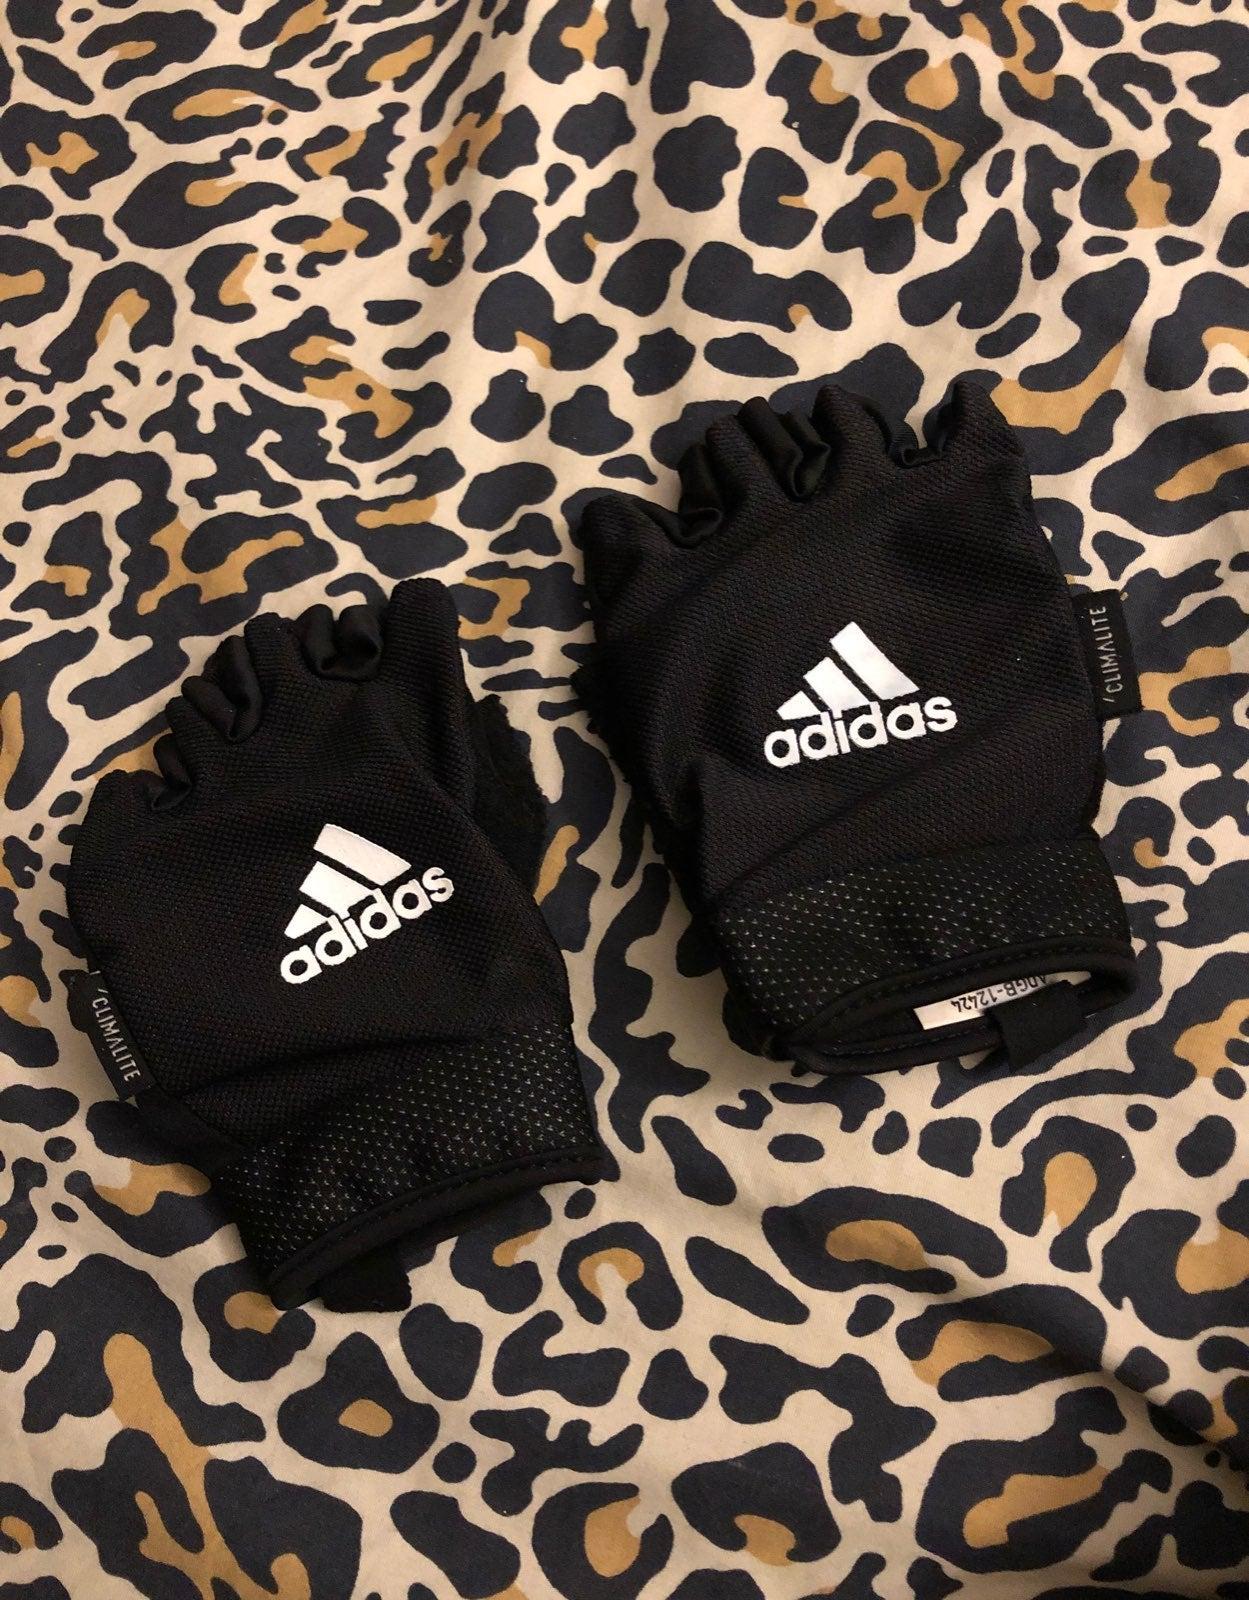 Adidas Women Gym Gloves Size Medium